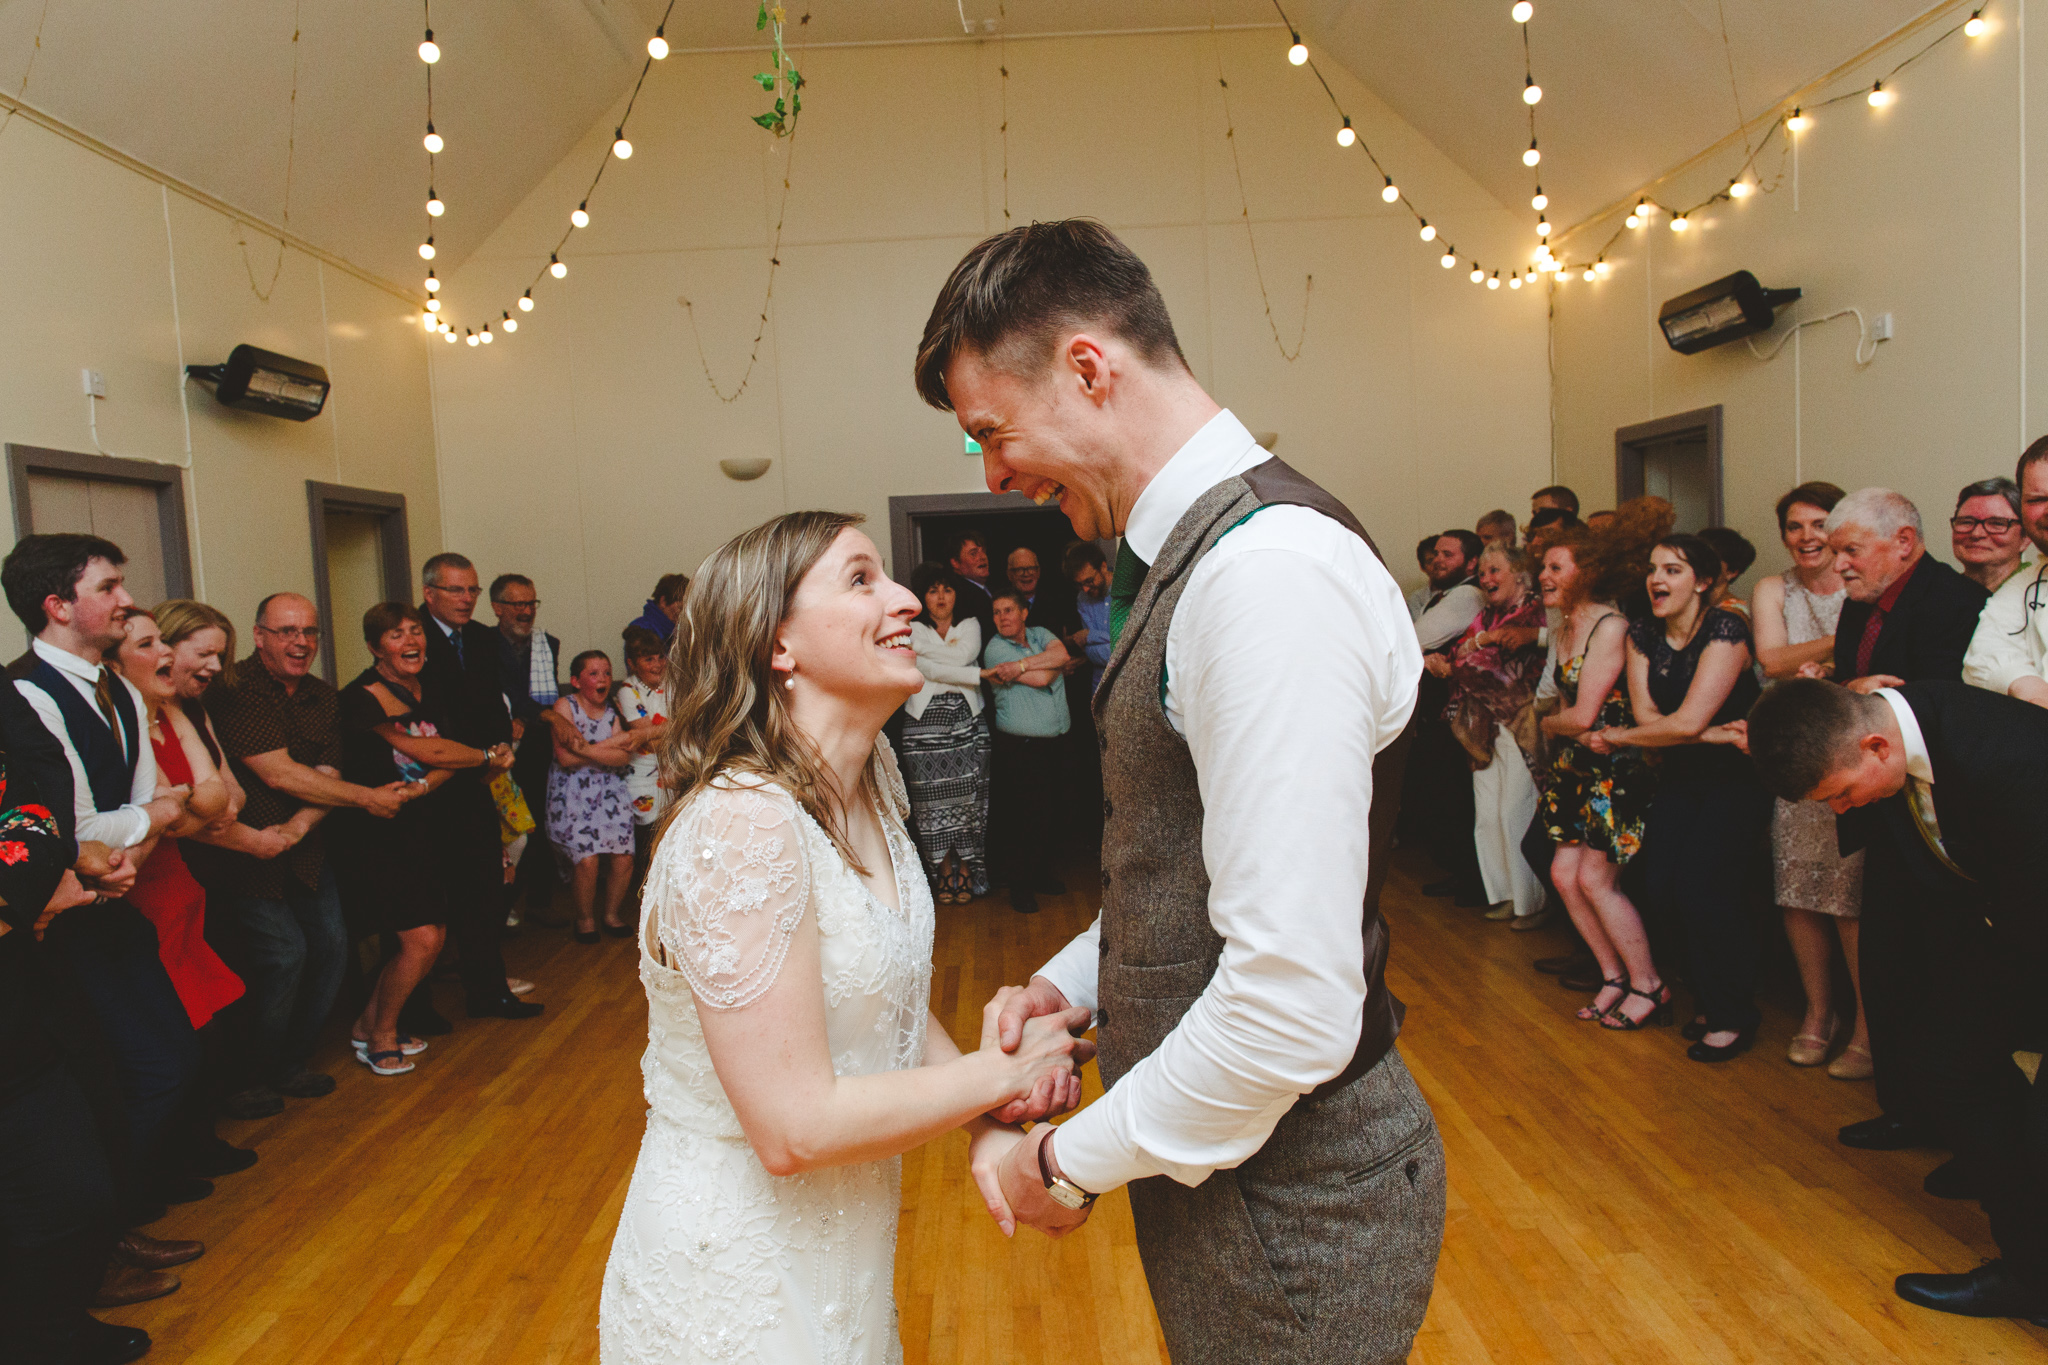 derbyshire-wedding-photographer-videographer-camera-hannah-72.jpg